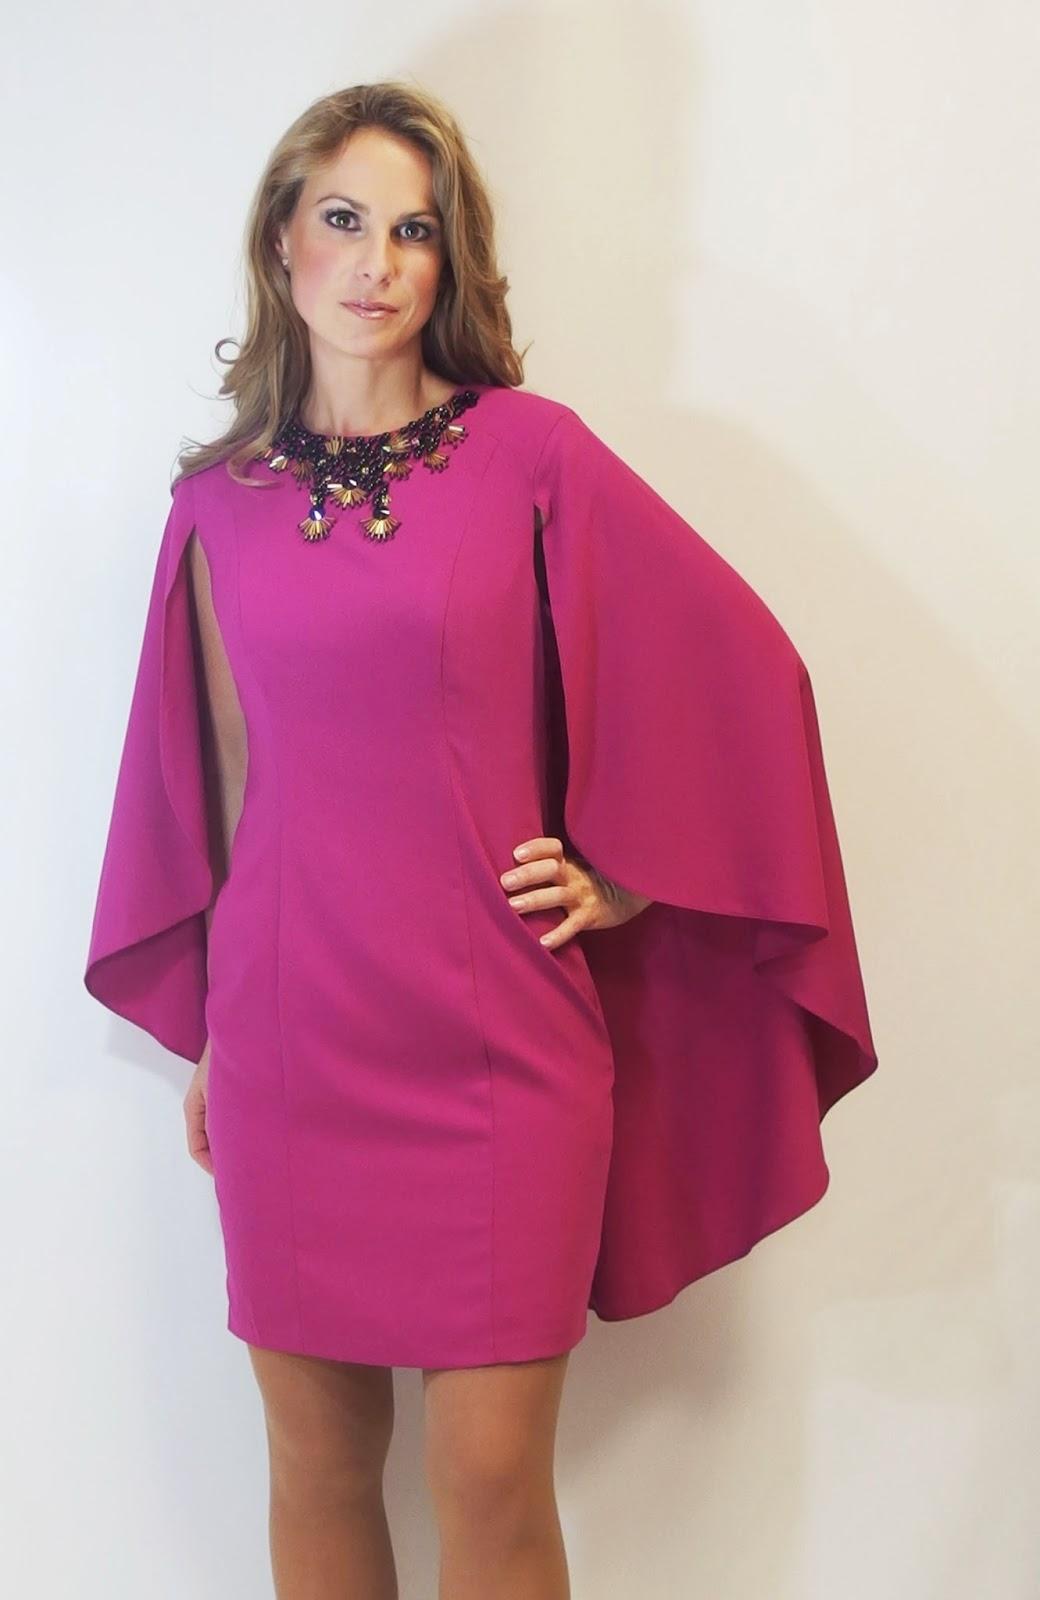 Vestido corto fiesta capa – Moda Española moderna